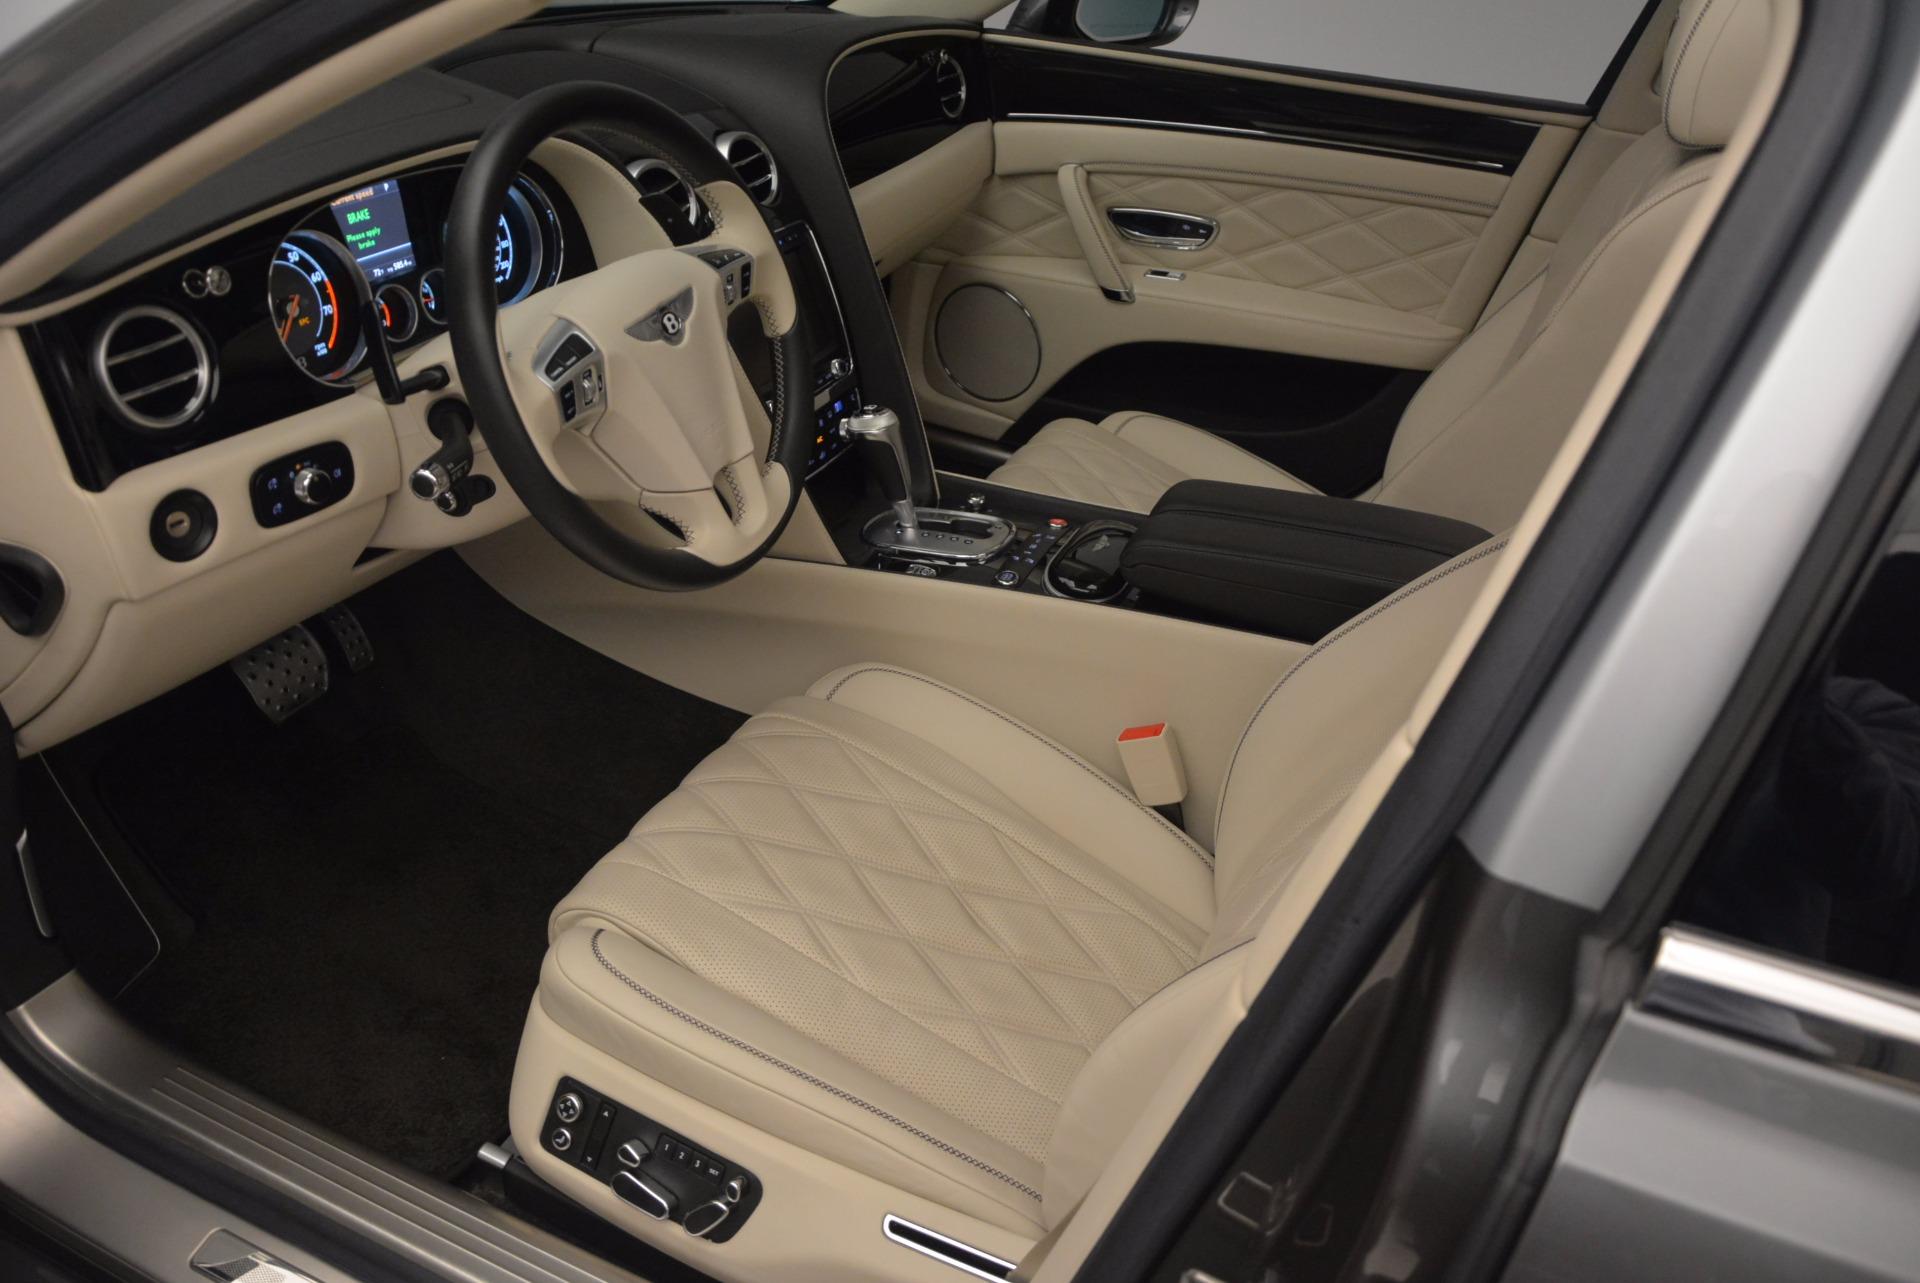 Used 2015 Bentley Flying Spur W12 For Sale In Westport, CT 1582_p22